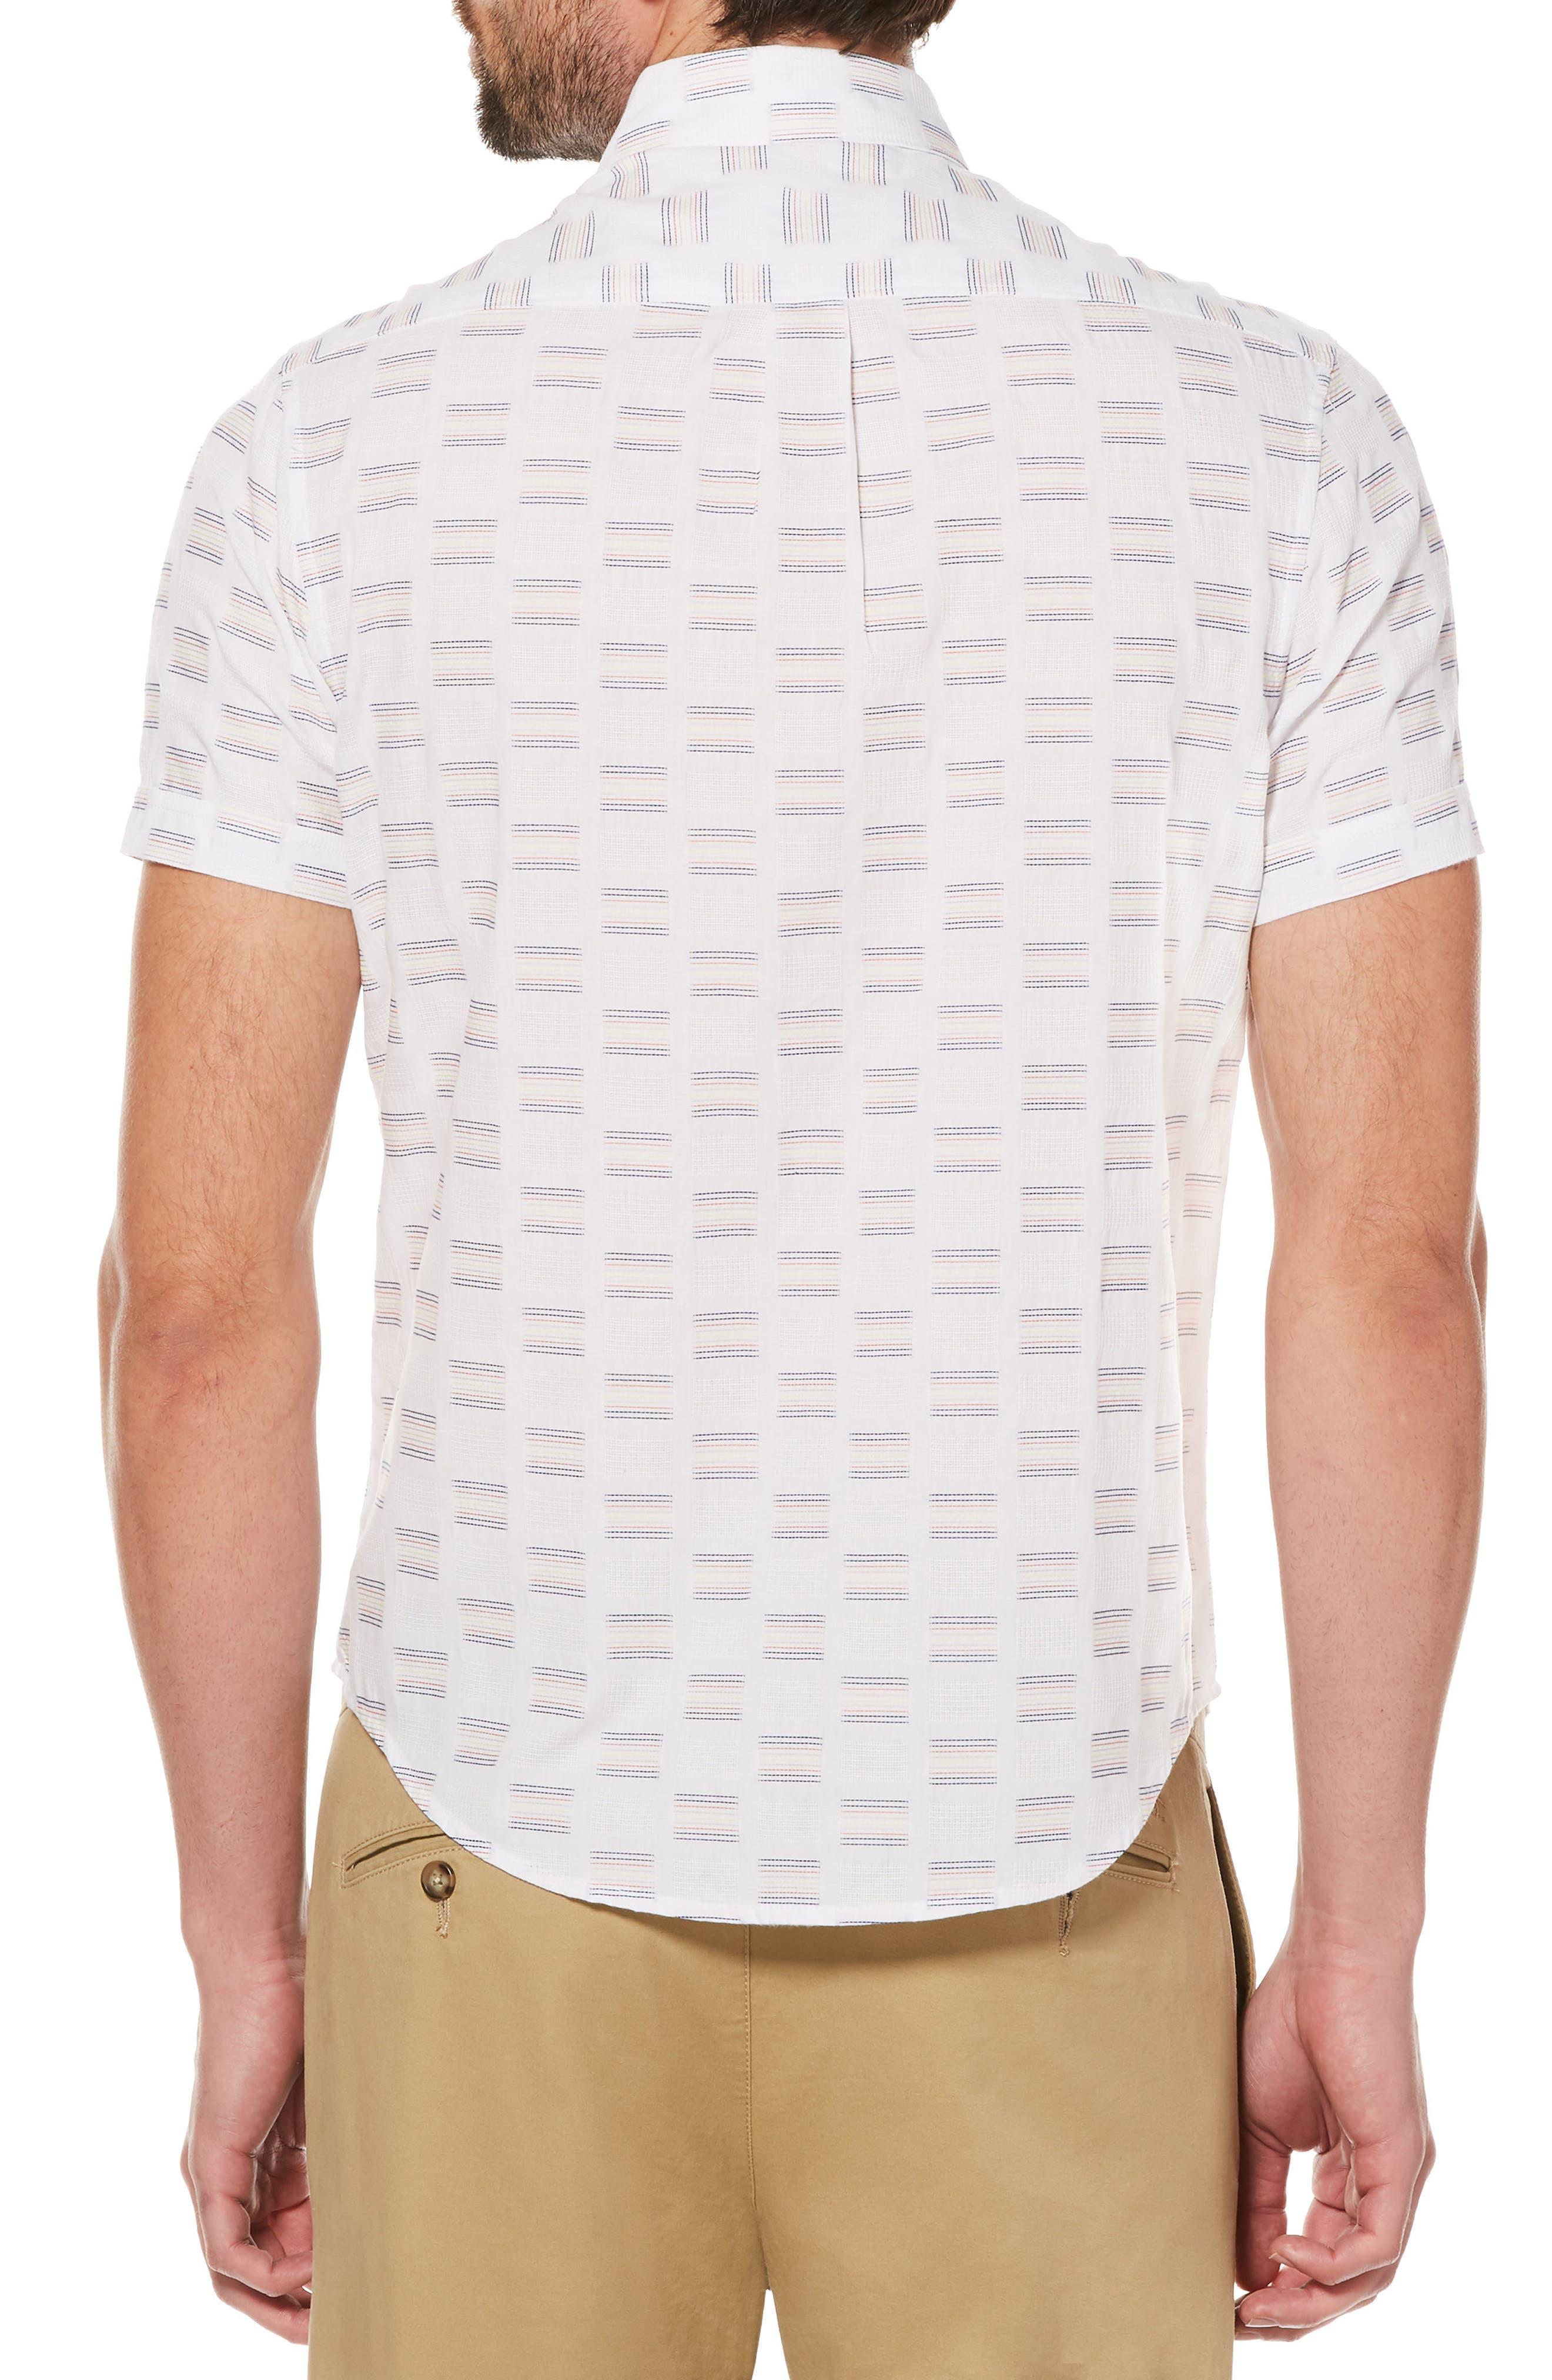 8-Bit Dobby Shirt,                             Alternate thumbnail 2, color,                             118